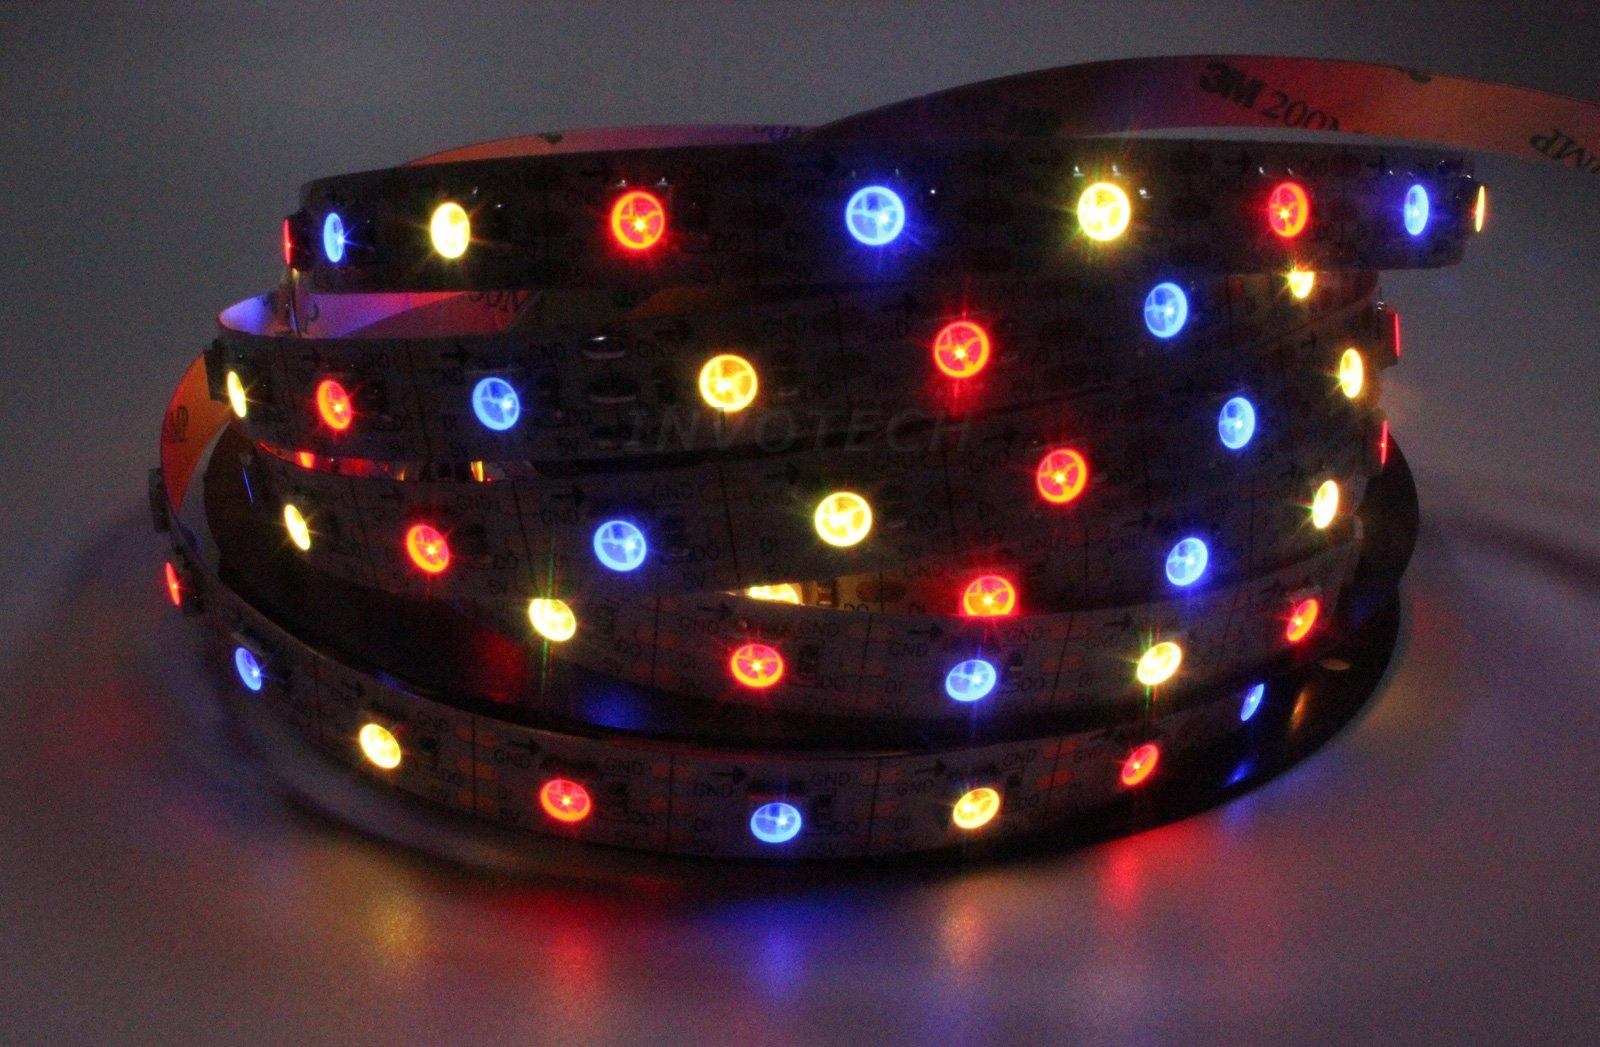 INVOLT 16.4ft 300 LEDs WS2812B Individually Addressable 5050 RGB LED Strip Light LED Pixel Flexible Lamp Waterproof IP65 White PCB